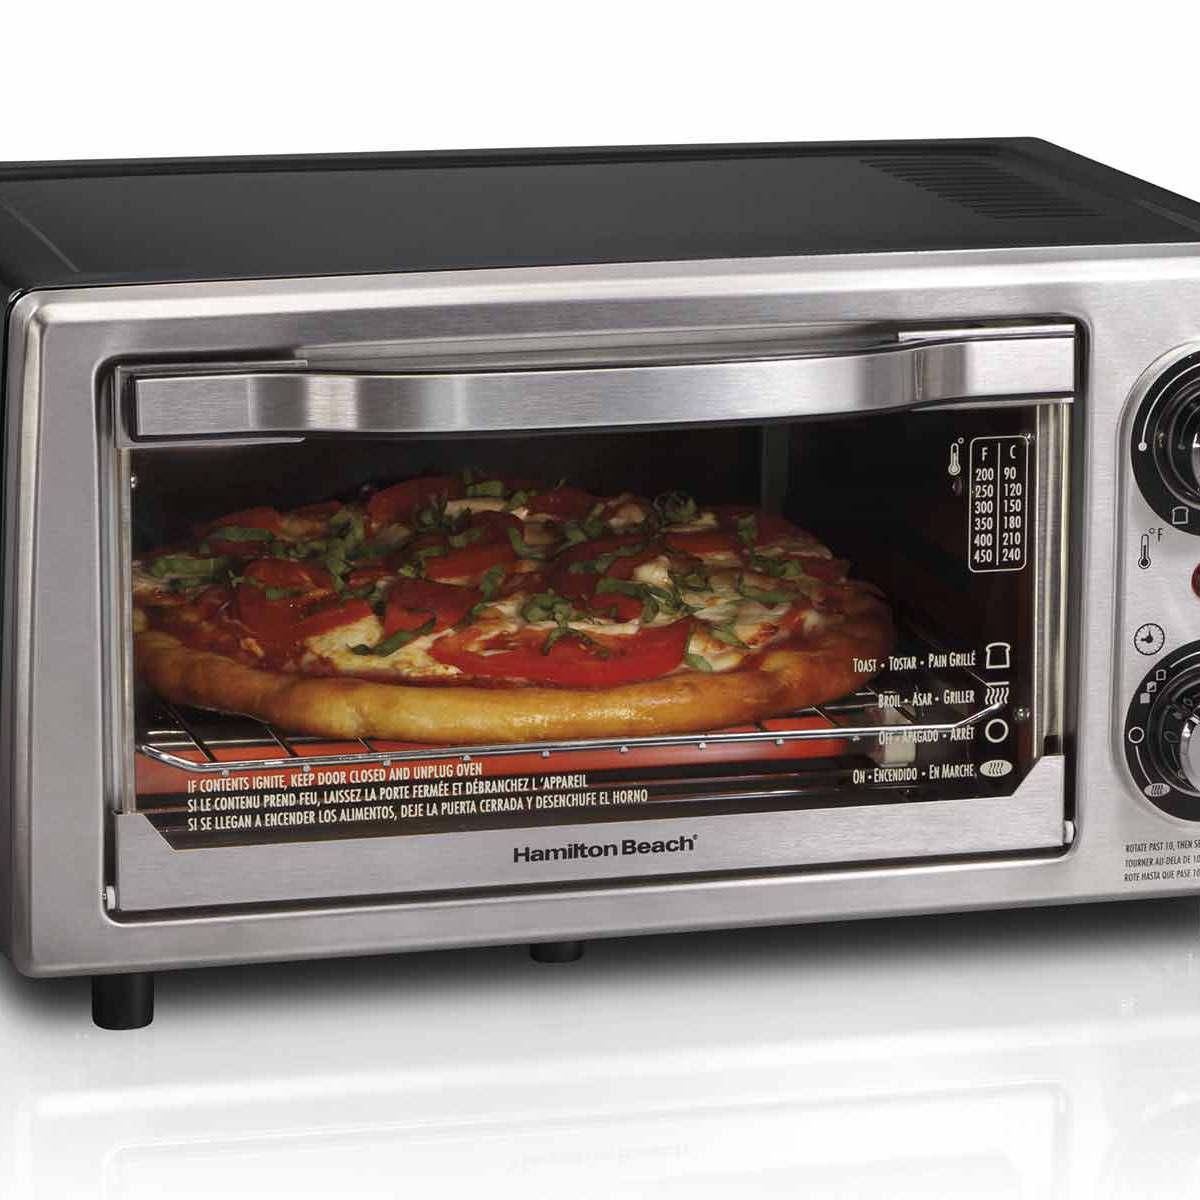 4 Slice Toaster Oven (31139)